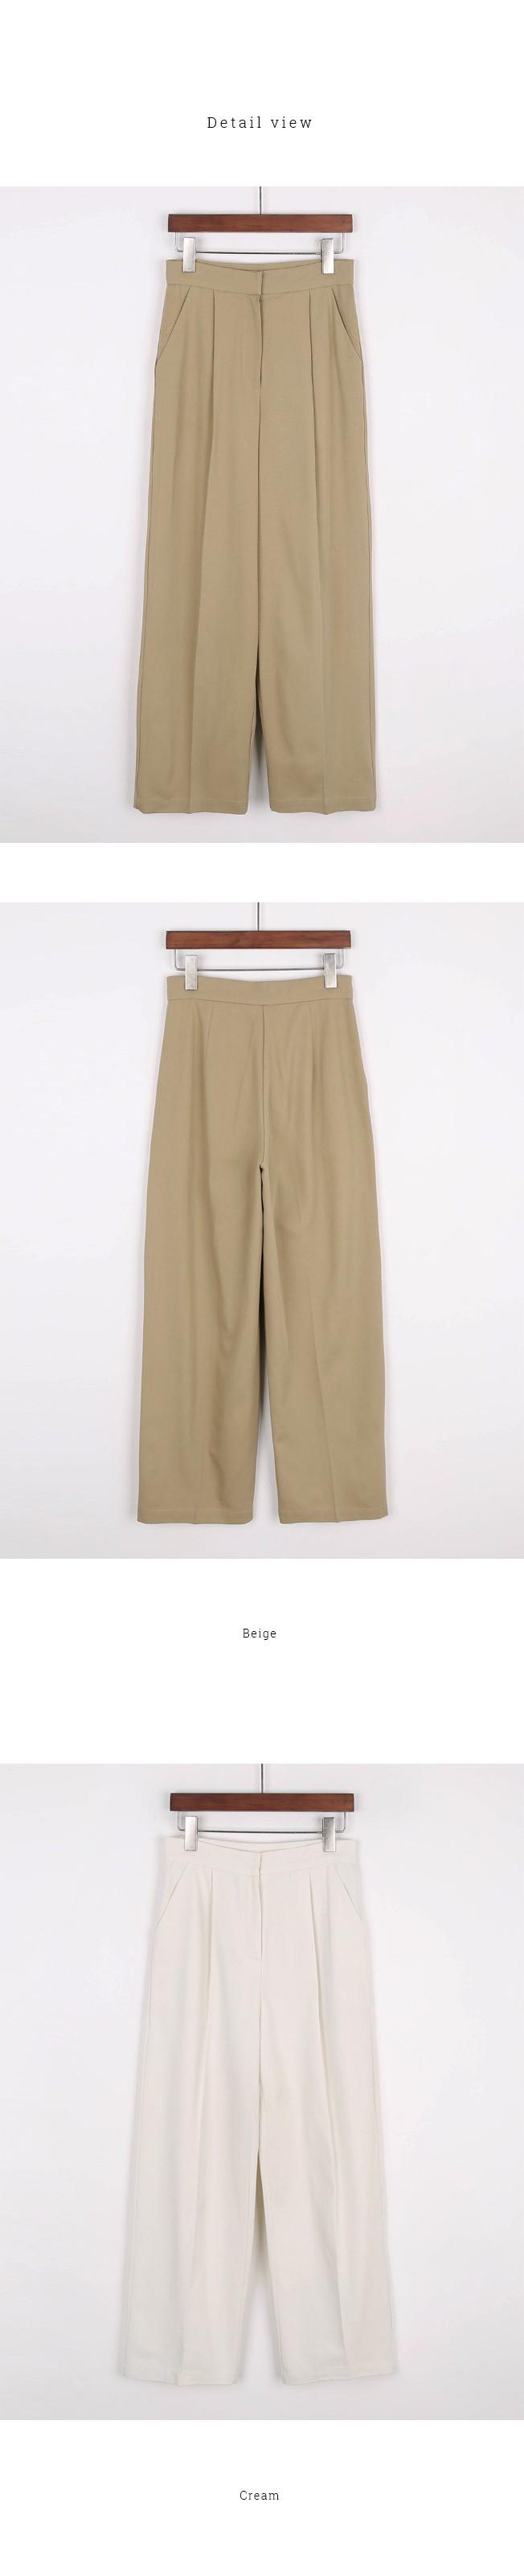 Beginning cotton pants